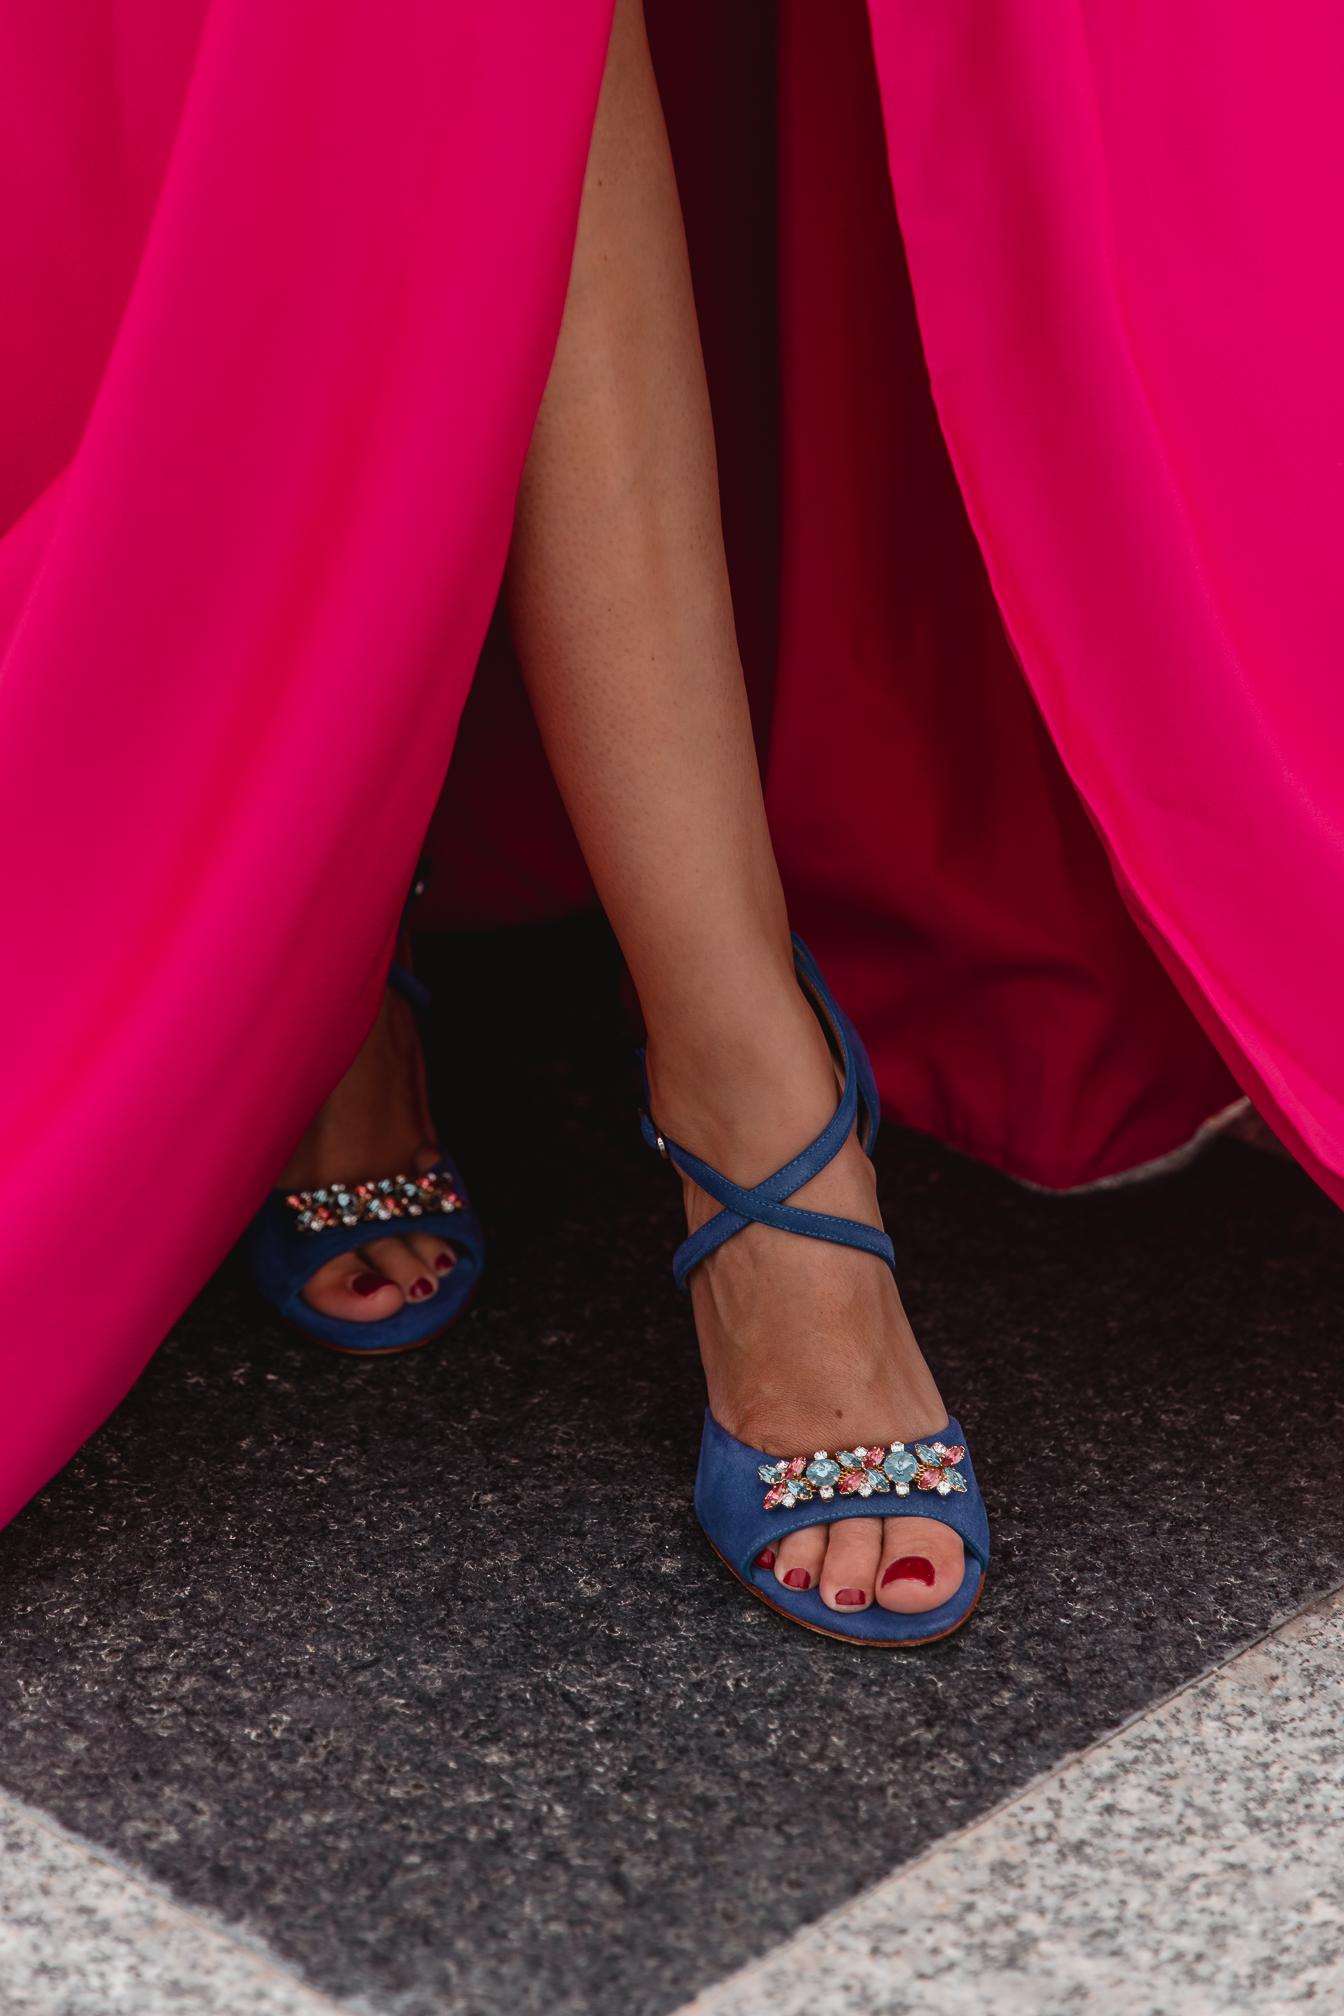 sandalias azul klein invitada boda